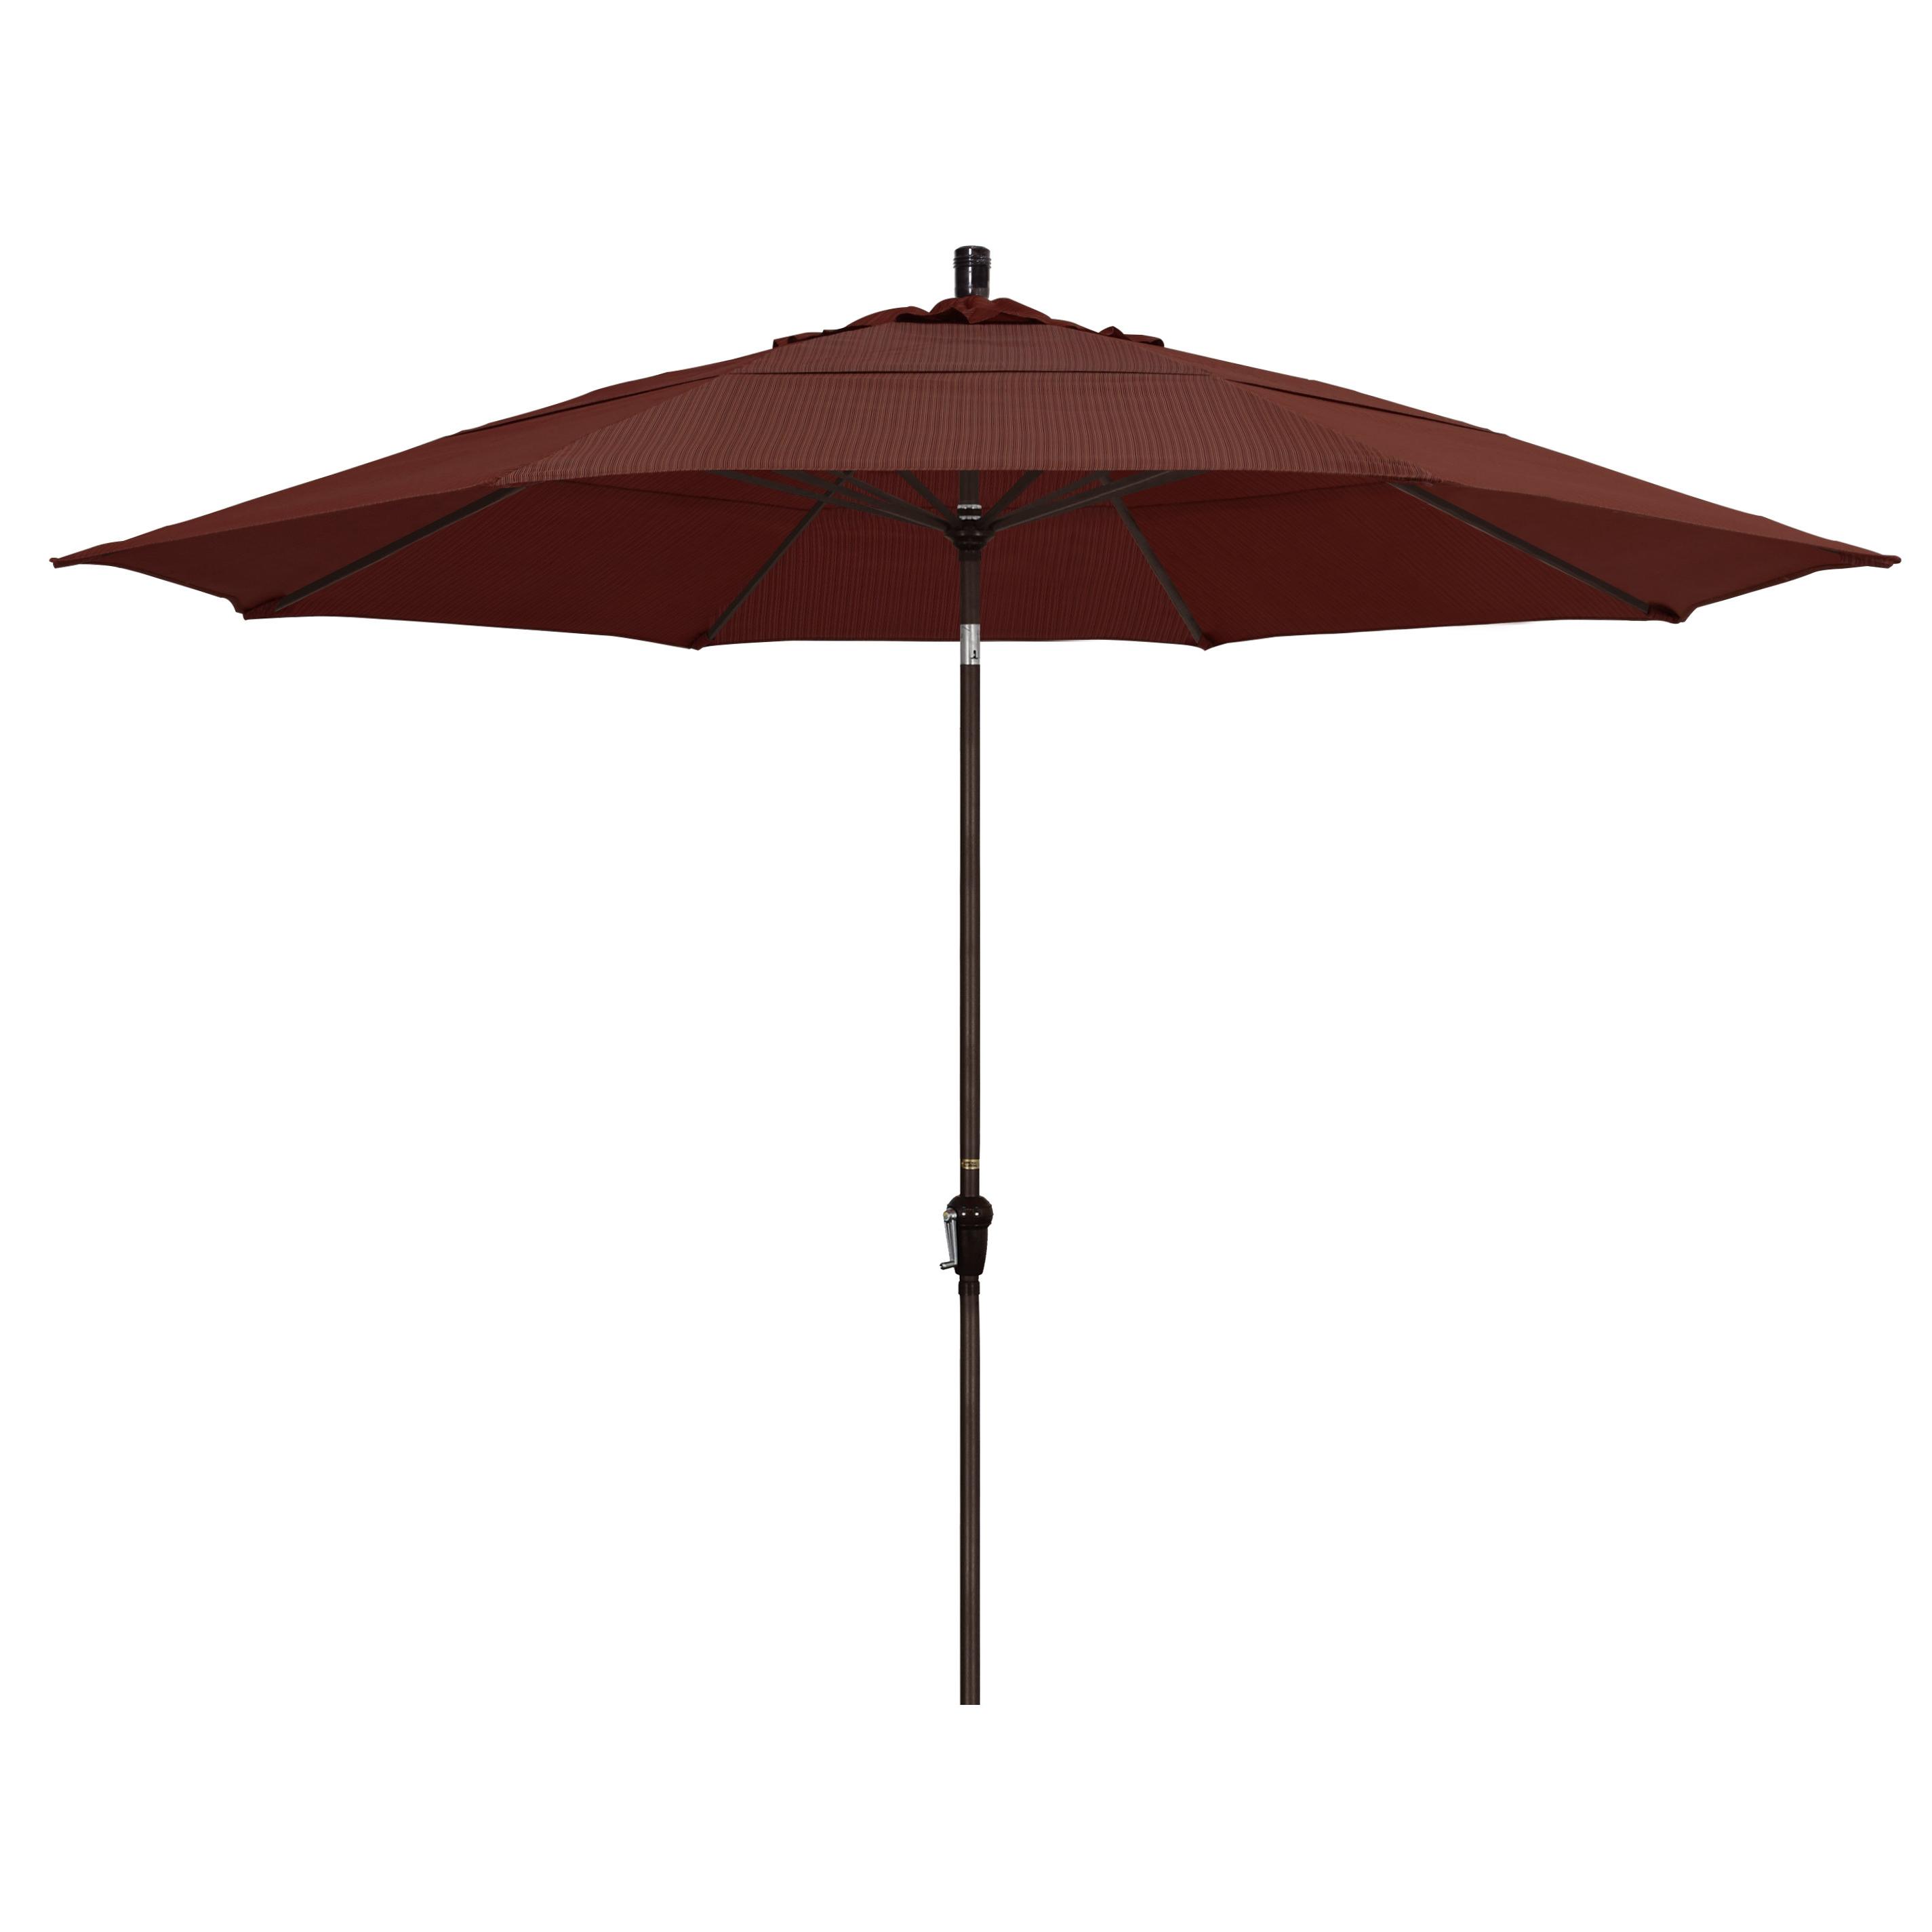 Mullaney 11' Market Umbrella Inside Most Recently Released Mullaney Market Umbrellas (View 5 of 20)